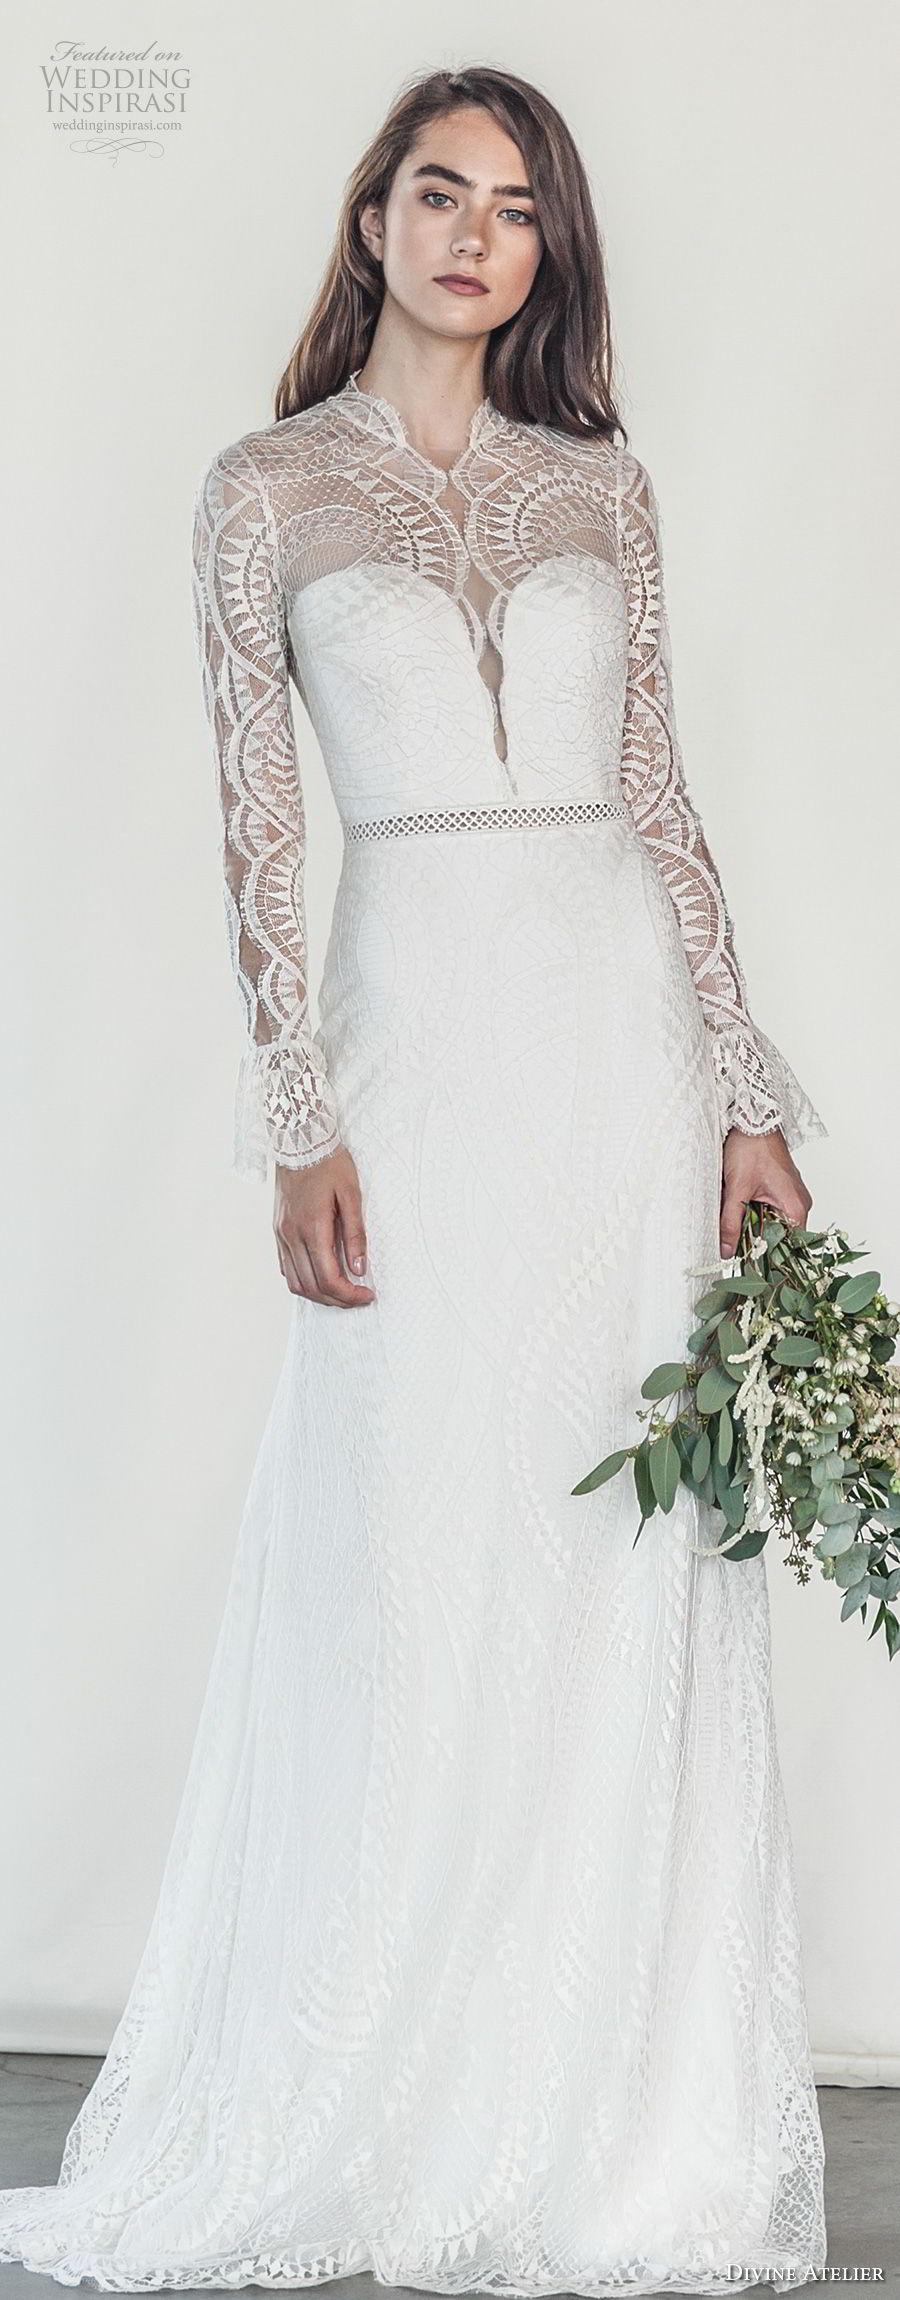 divine atelier 2018 bridal long sleeves illusion high neck sweetheart neckline heavily embellished bodice elegant romantic soft a  line wedding dress keyhole back sweep train (19) mv